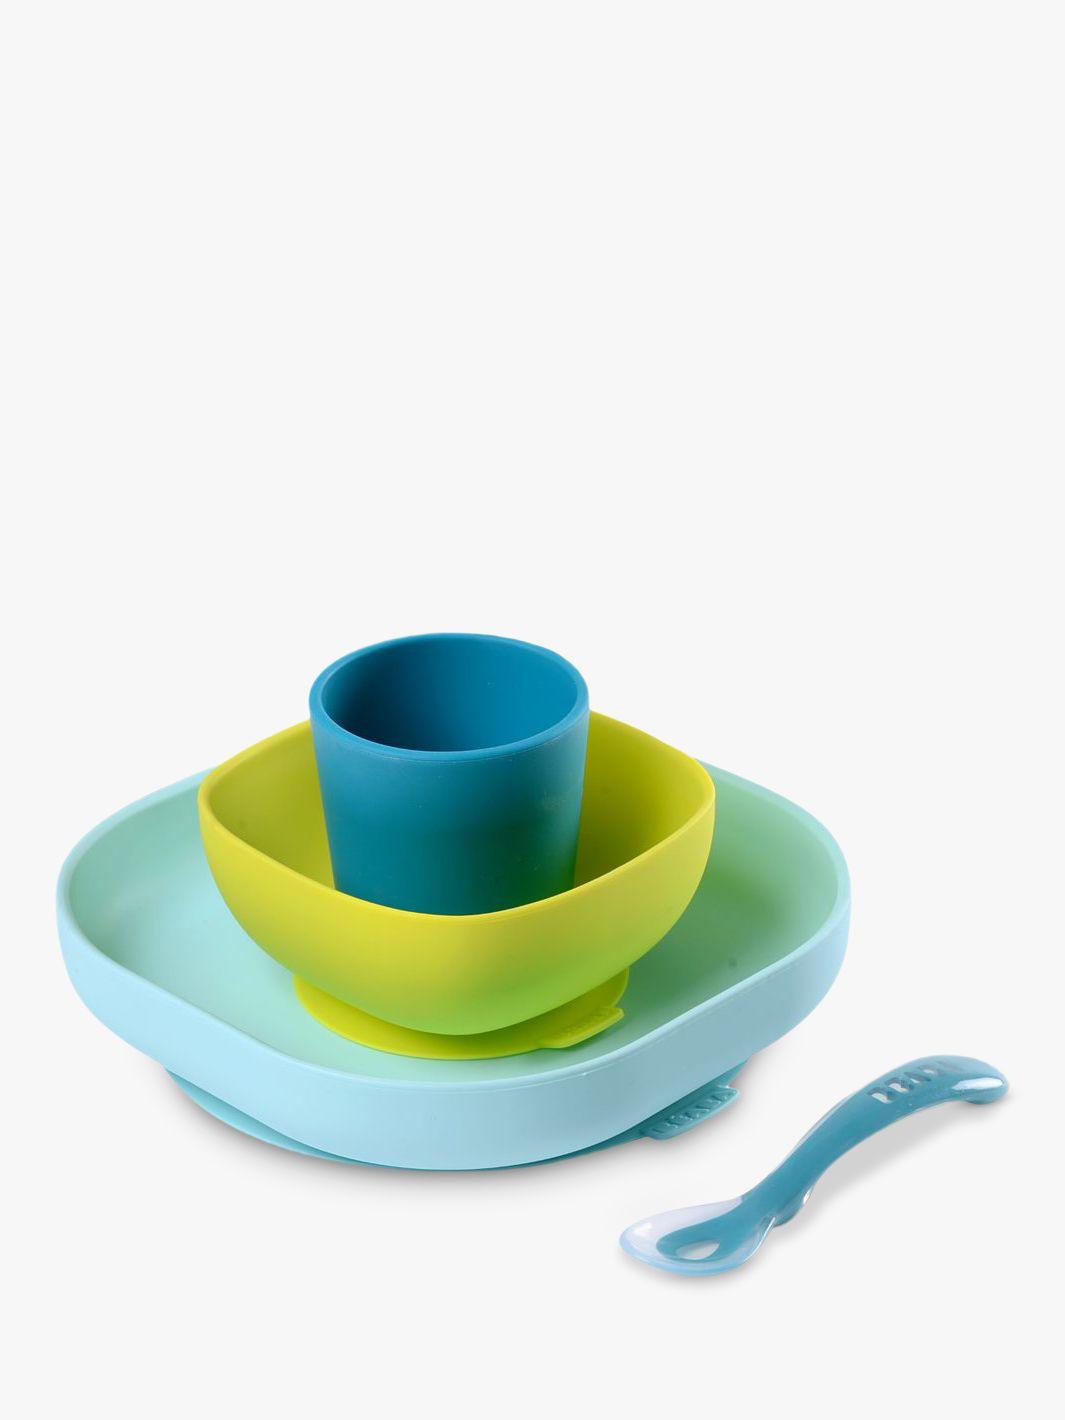 Beaba Beaba Silicone Feeding Set, 4 Pieces, Blue